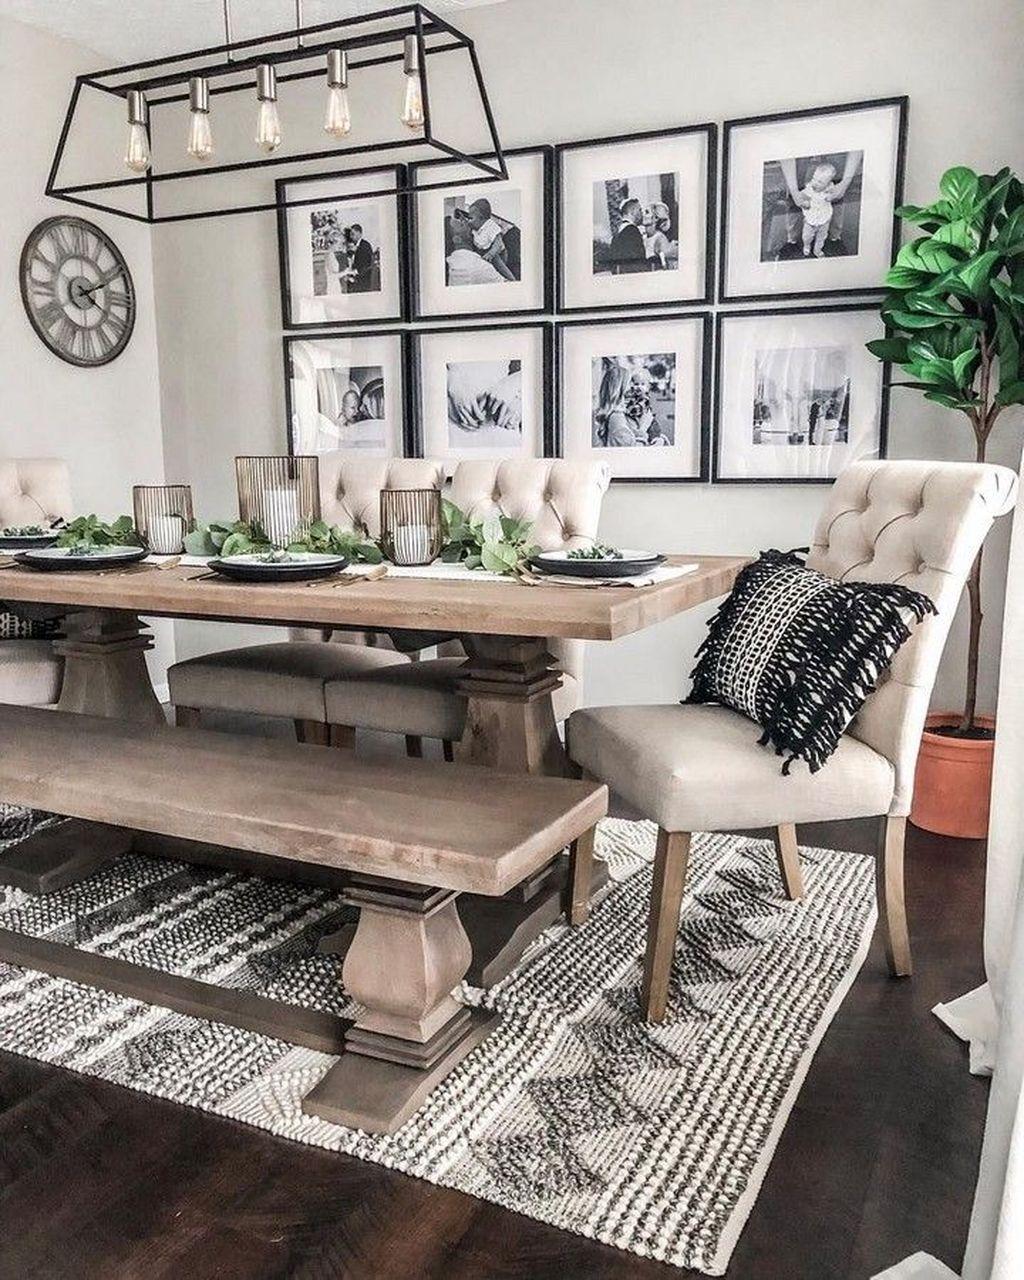 Admirable Dining Room Design Ideas 17